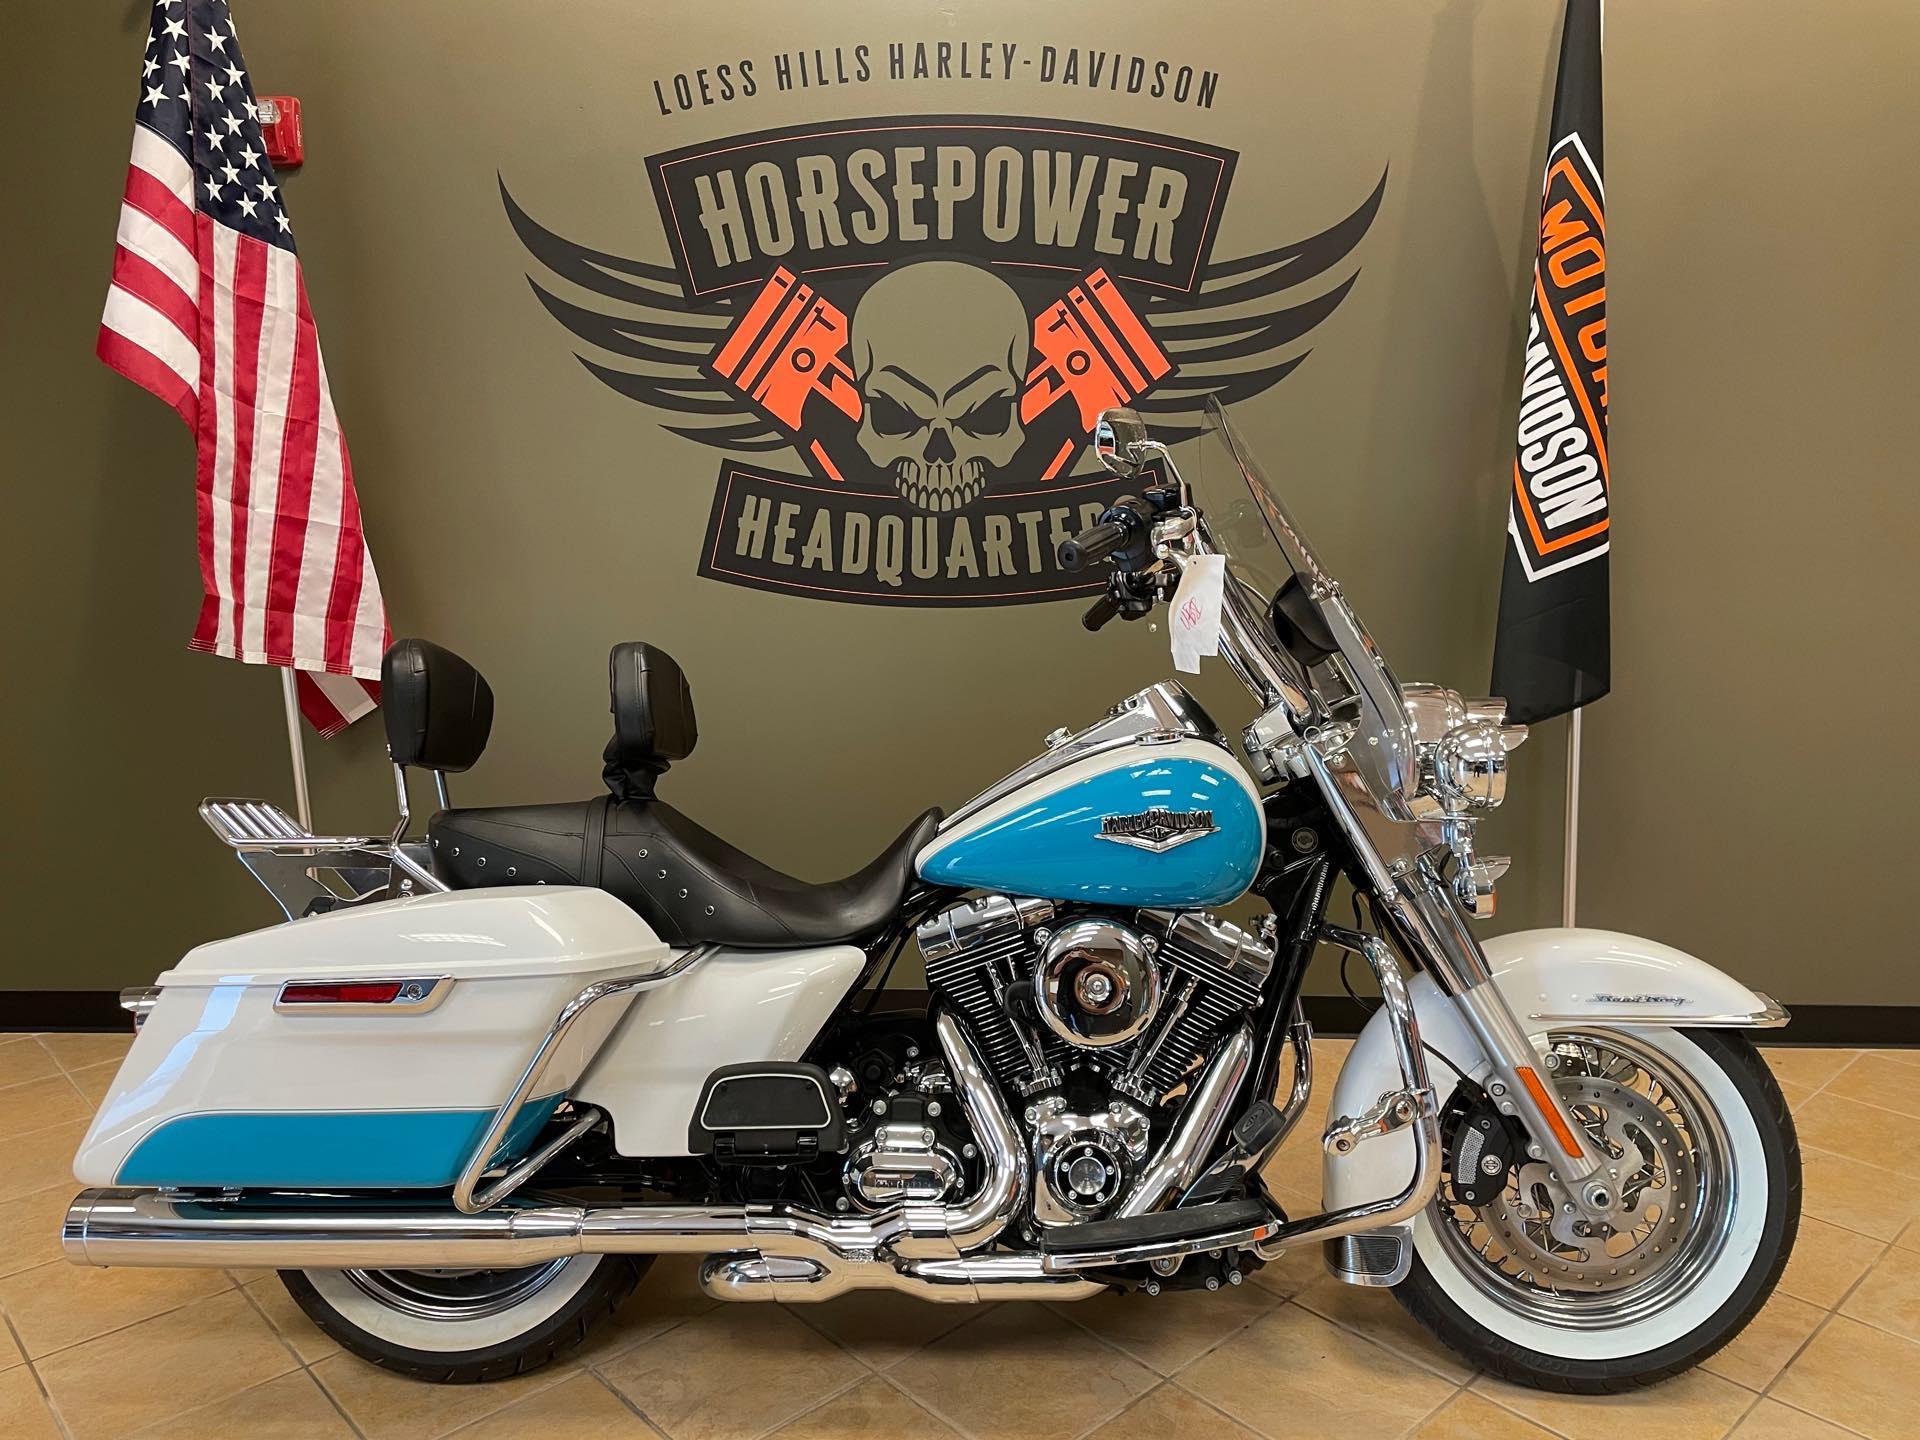 2016 Harley-Davidson Road King Base at Loess Hills Harley-Davidson